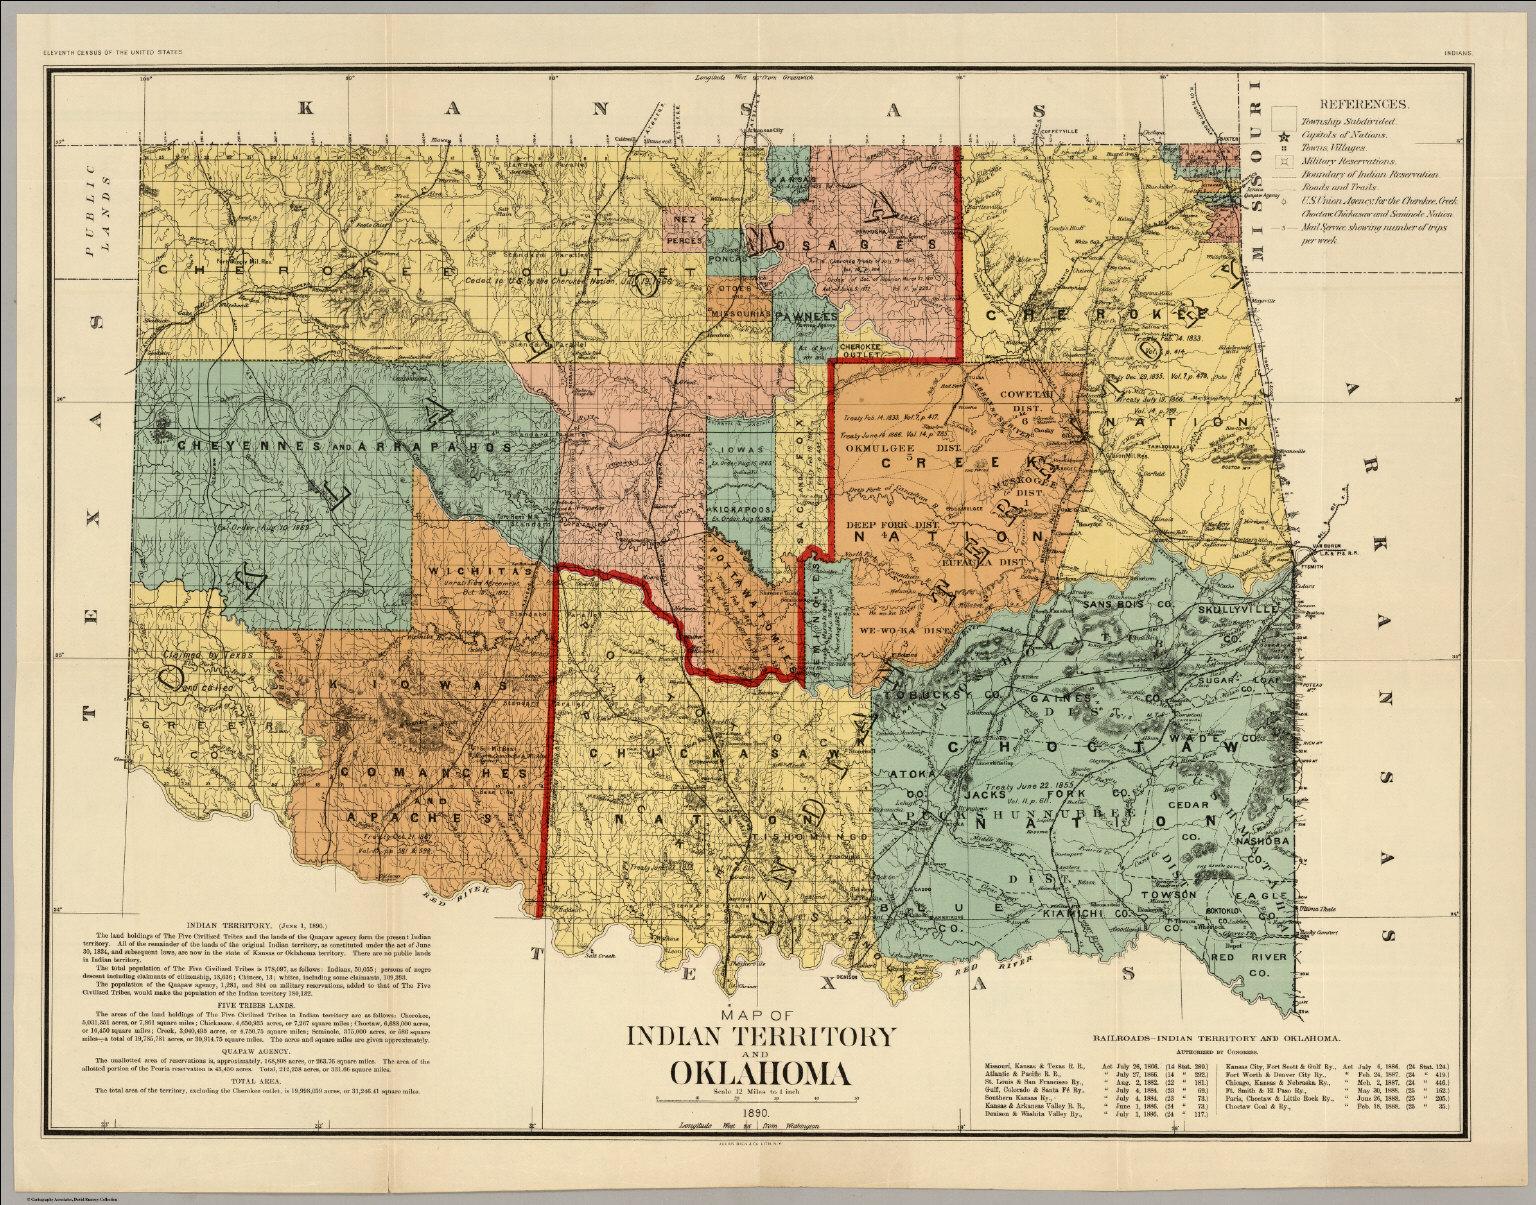 oklahoma indian territory1890 9